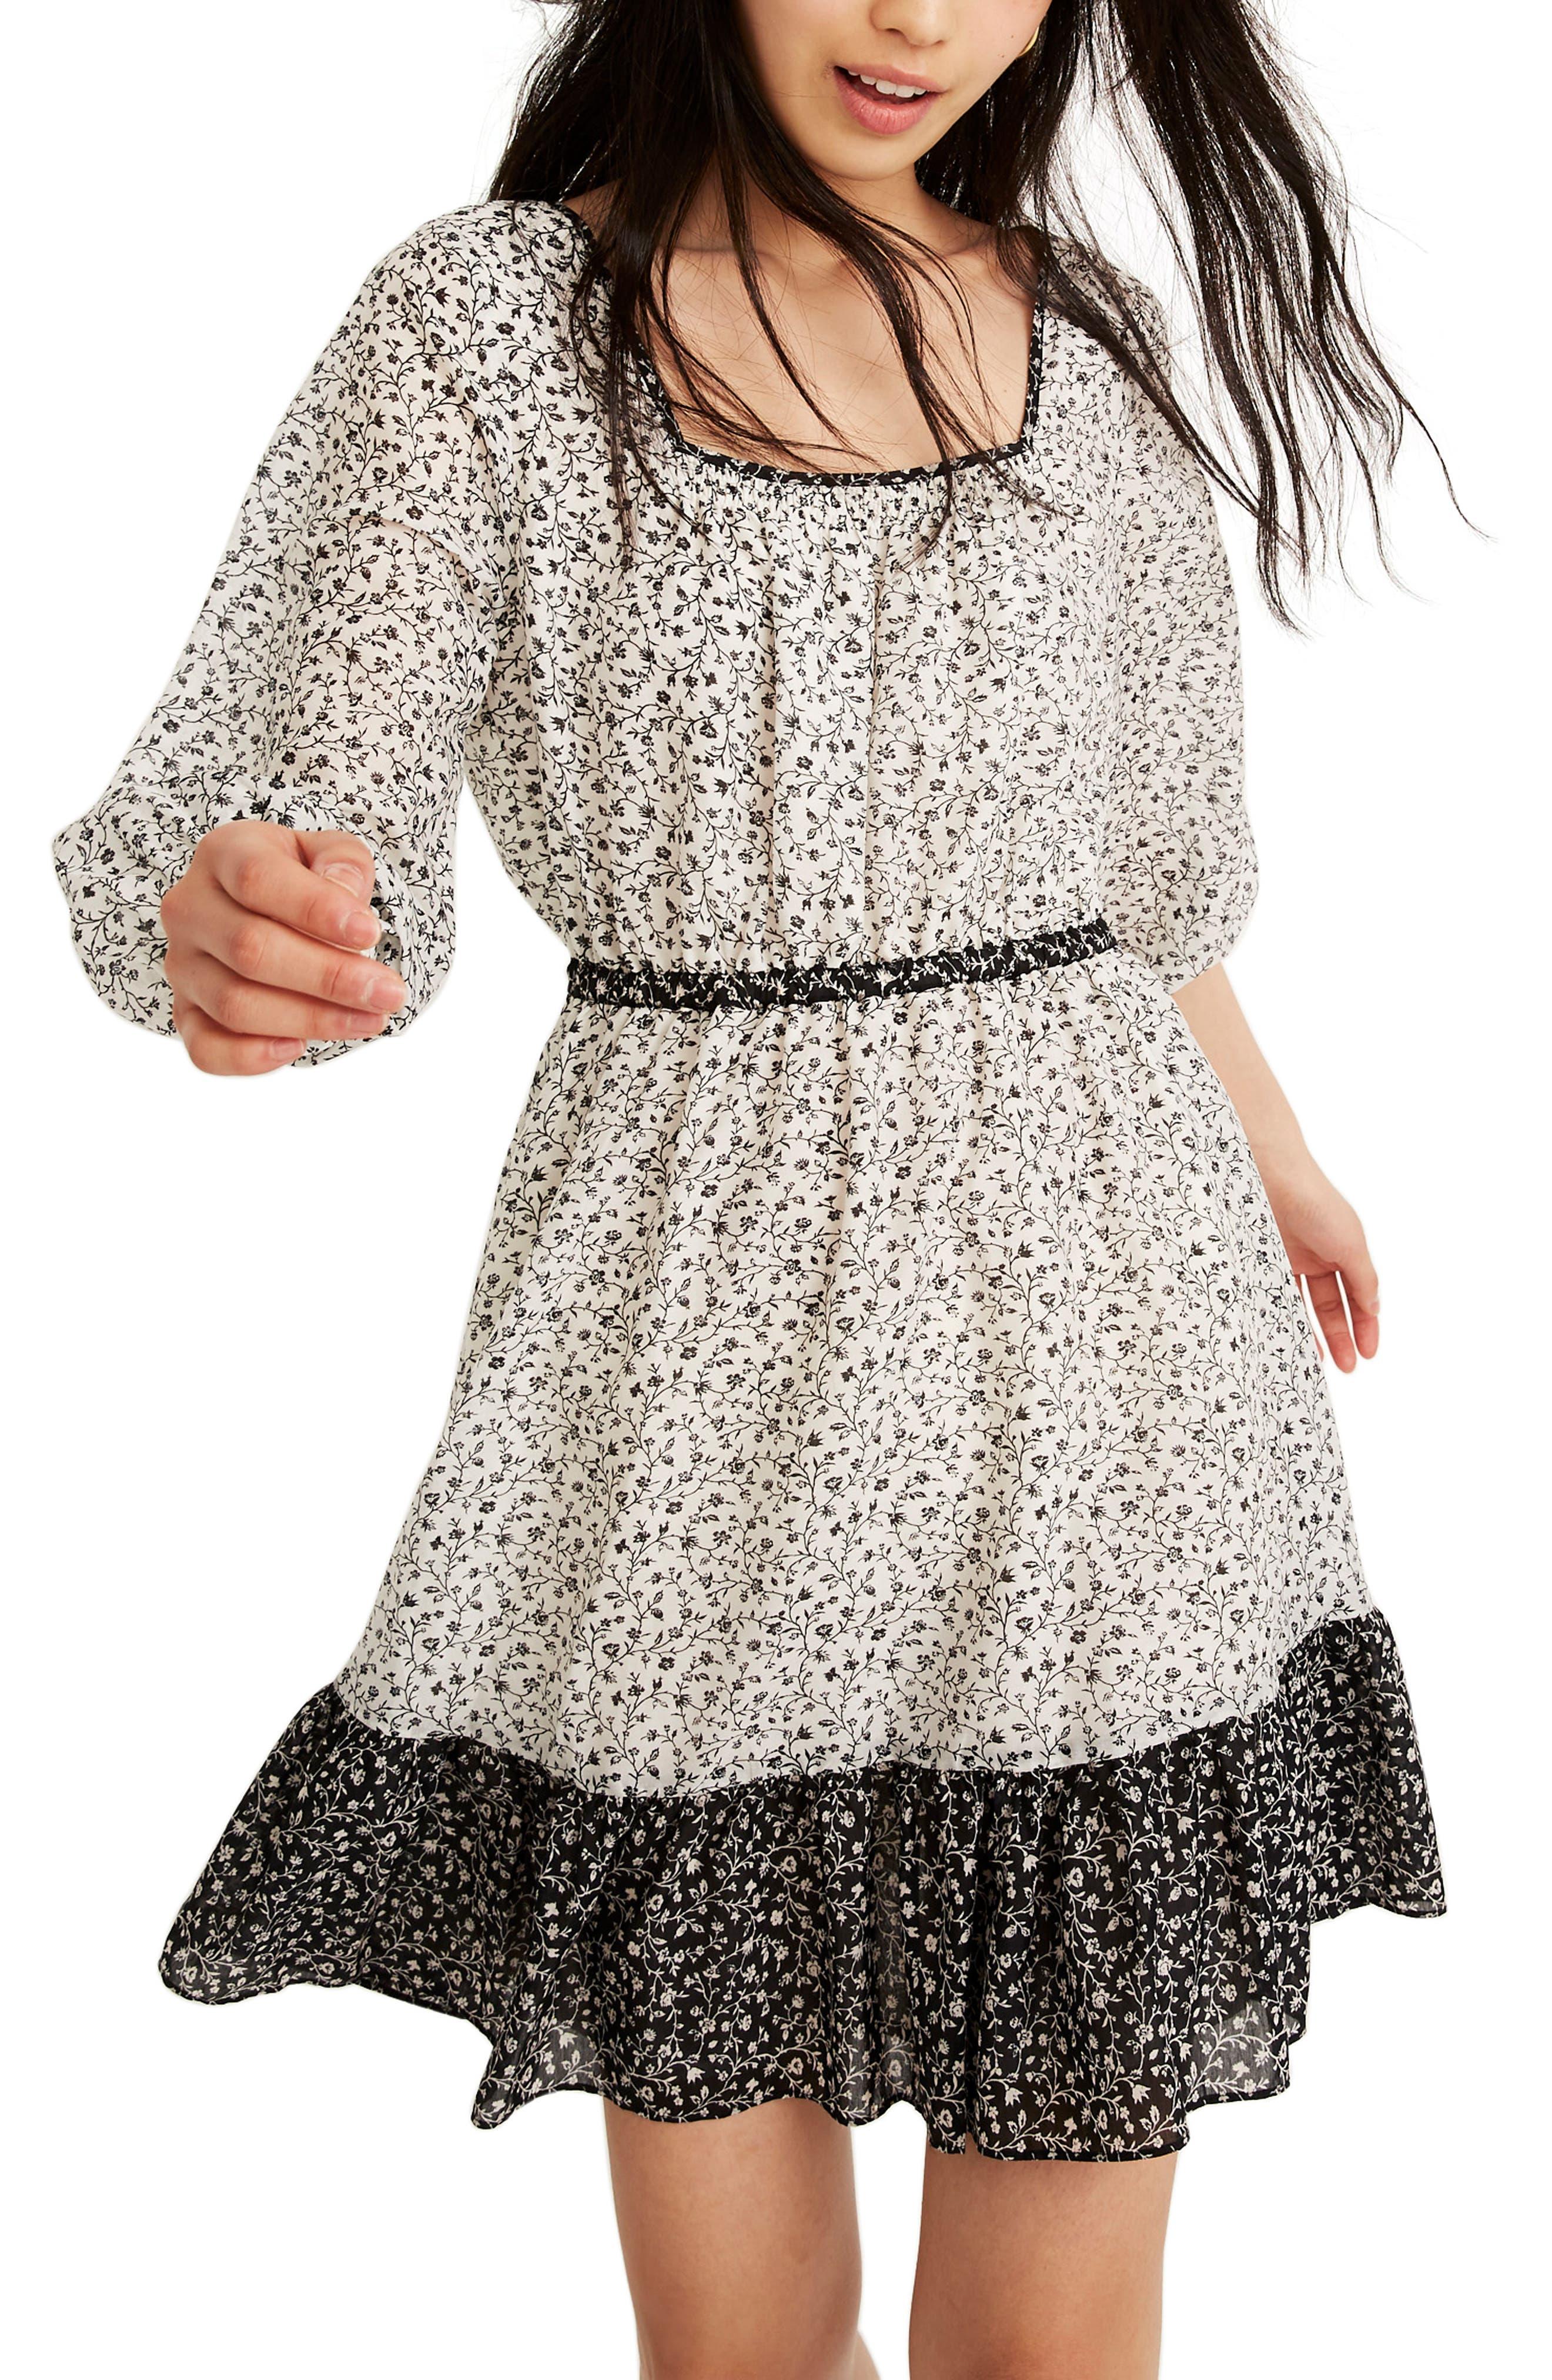 Madewell Garden Toile Pattern Mix Ruffle Hem Dress, Ivory